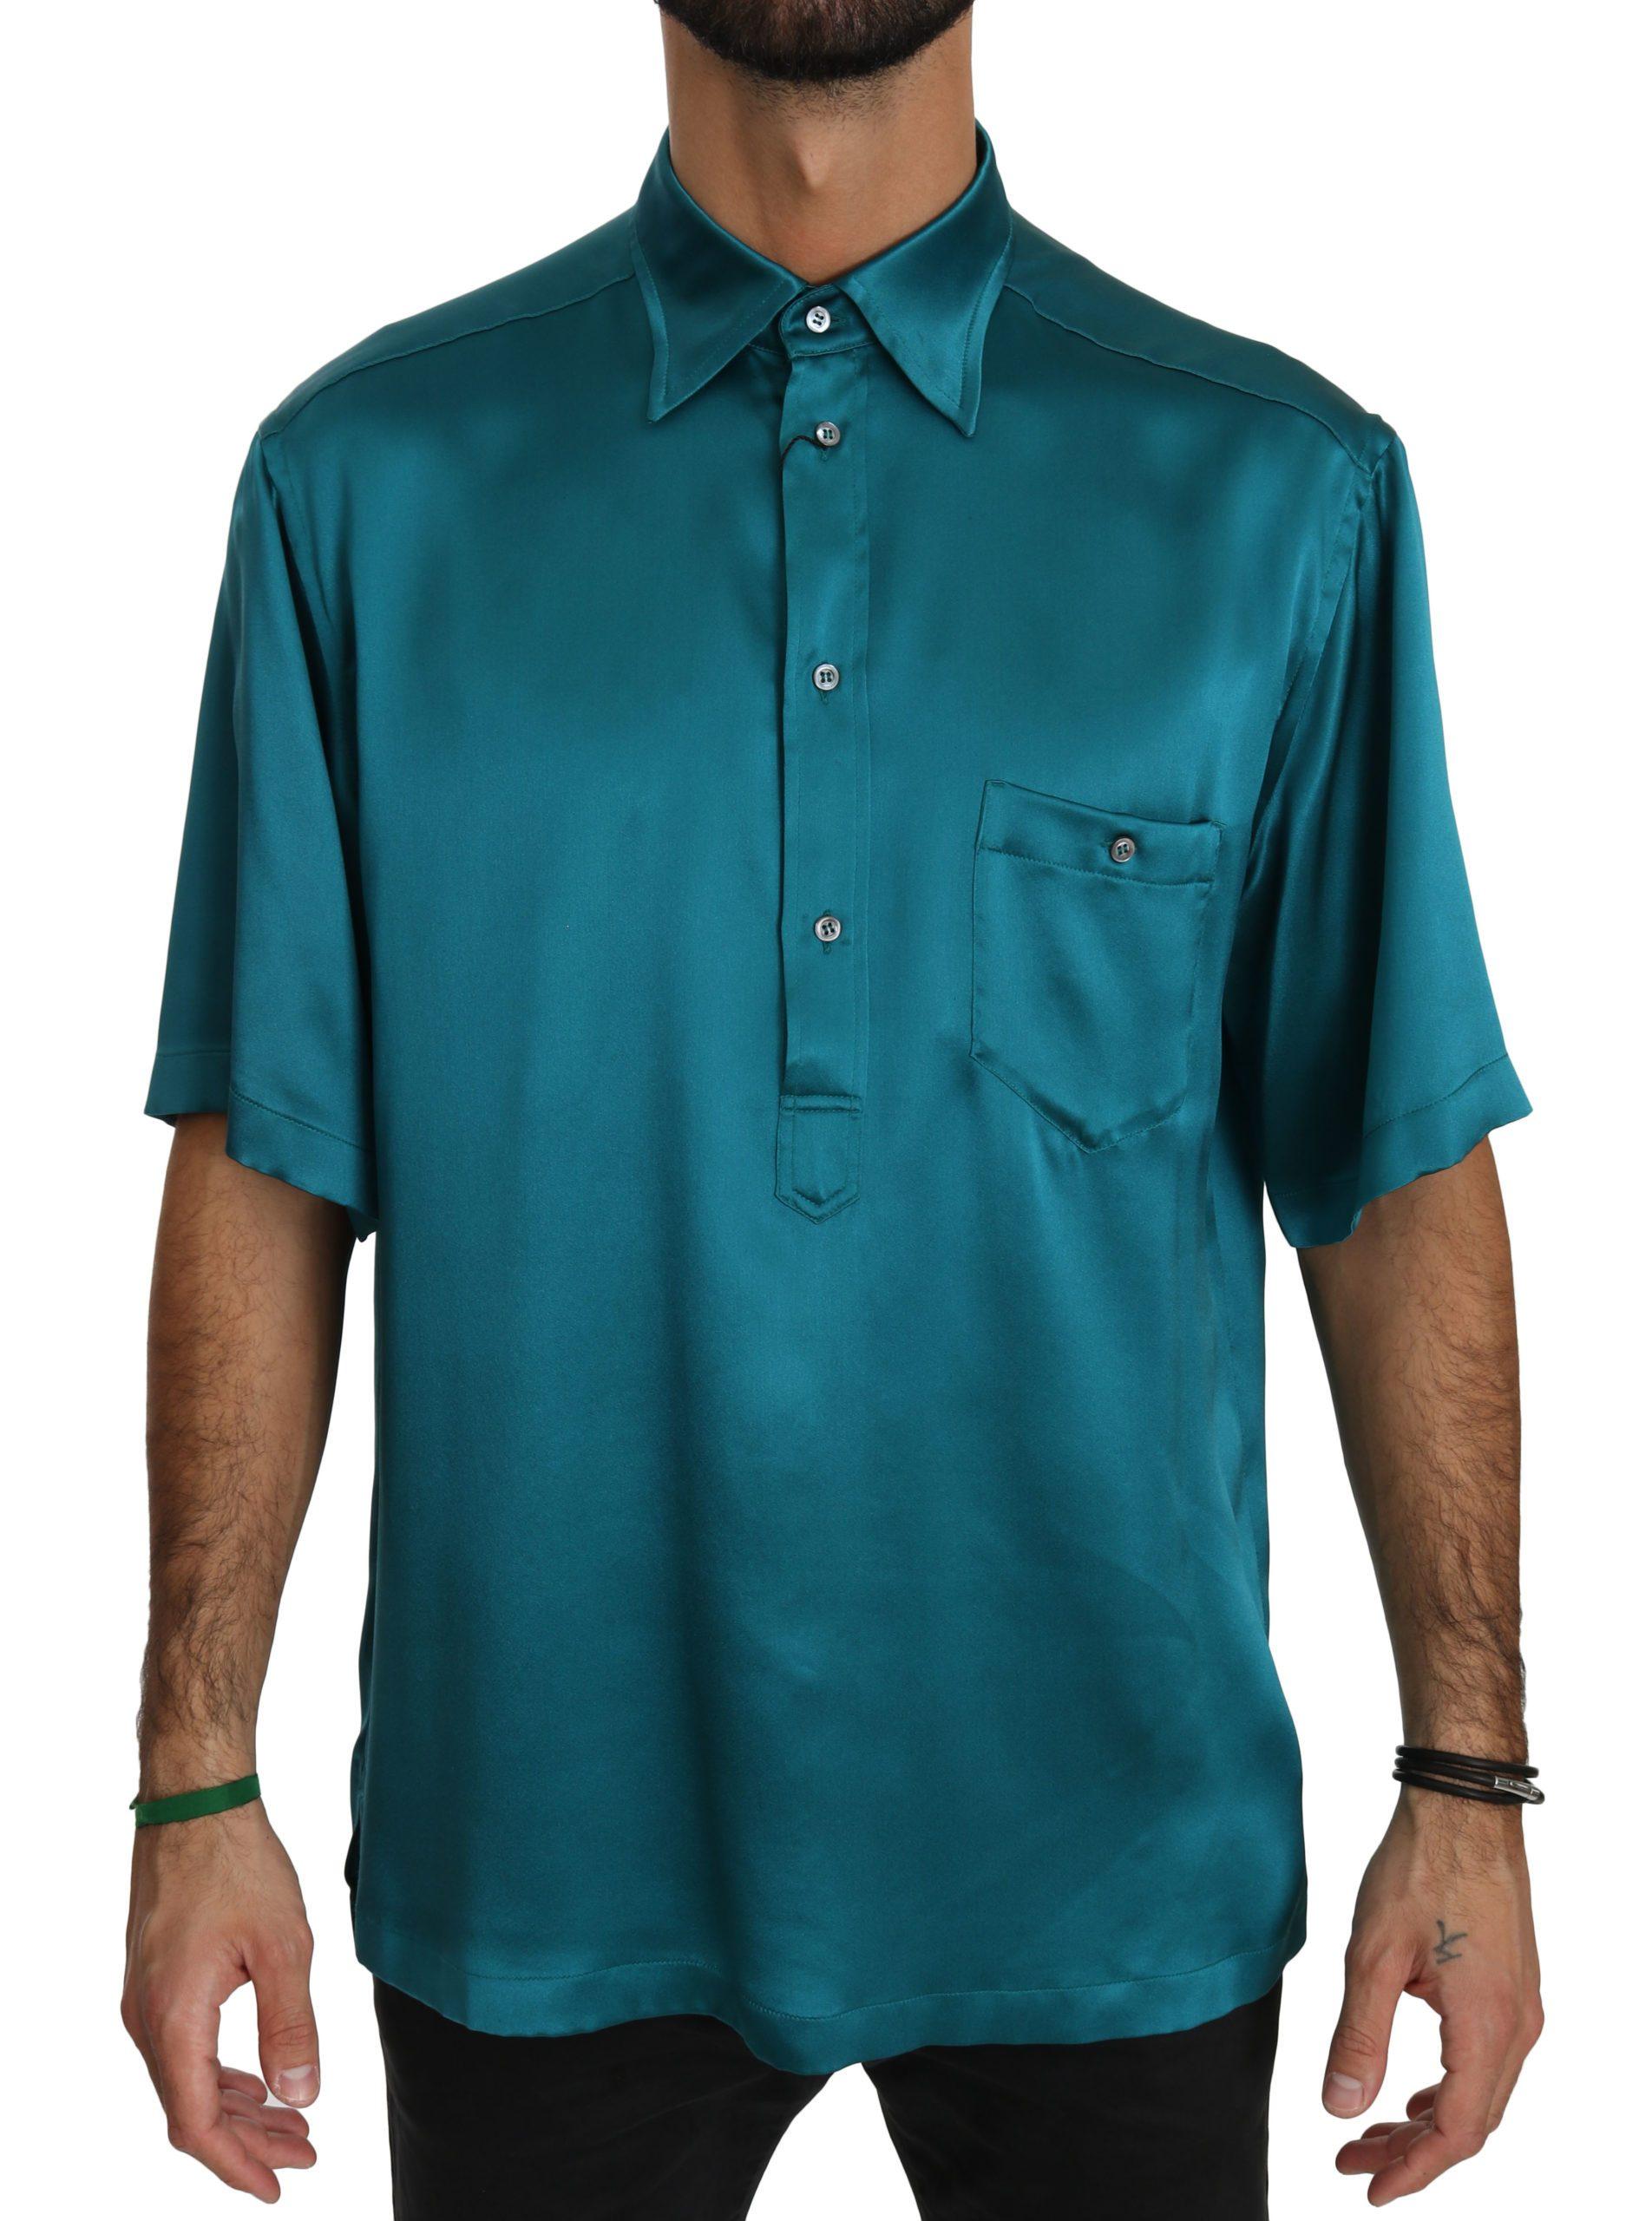 Dolce & Gabbana Men's Short Sleeve 100% Silk Shirt Blue TSH4016 - IT40   M